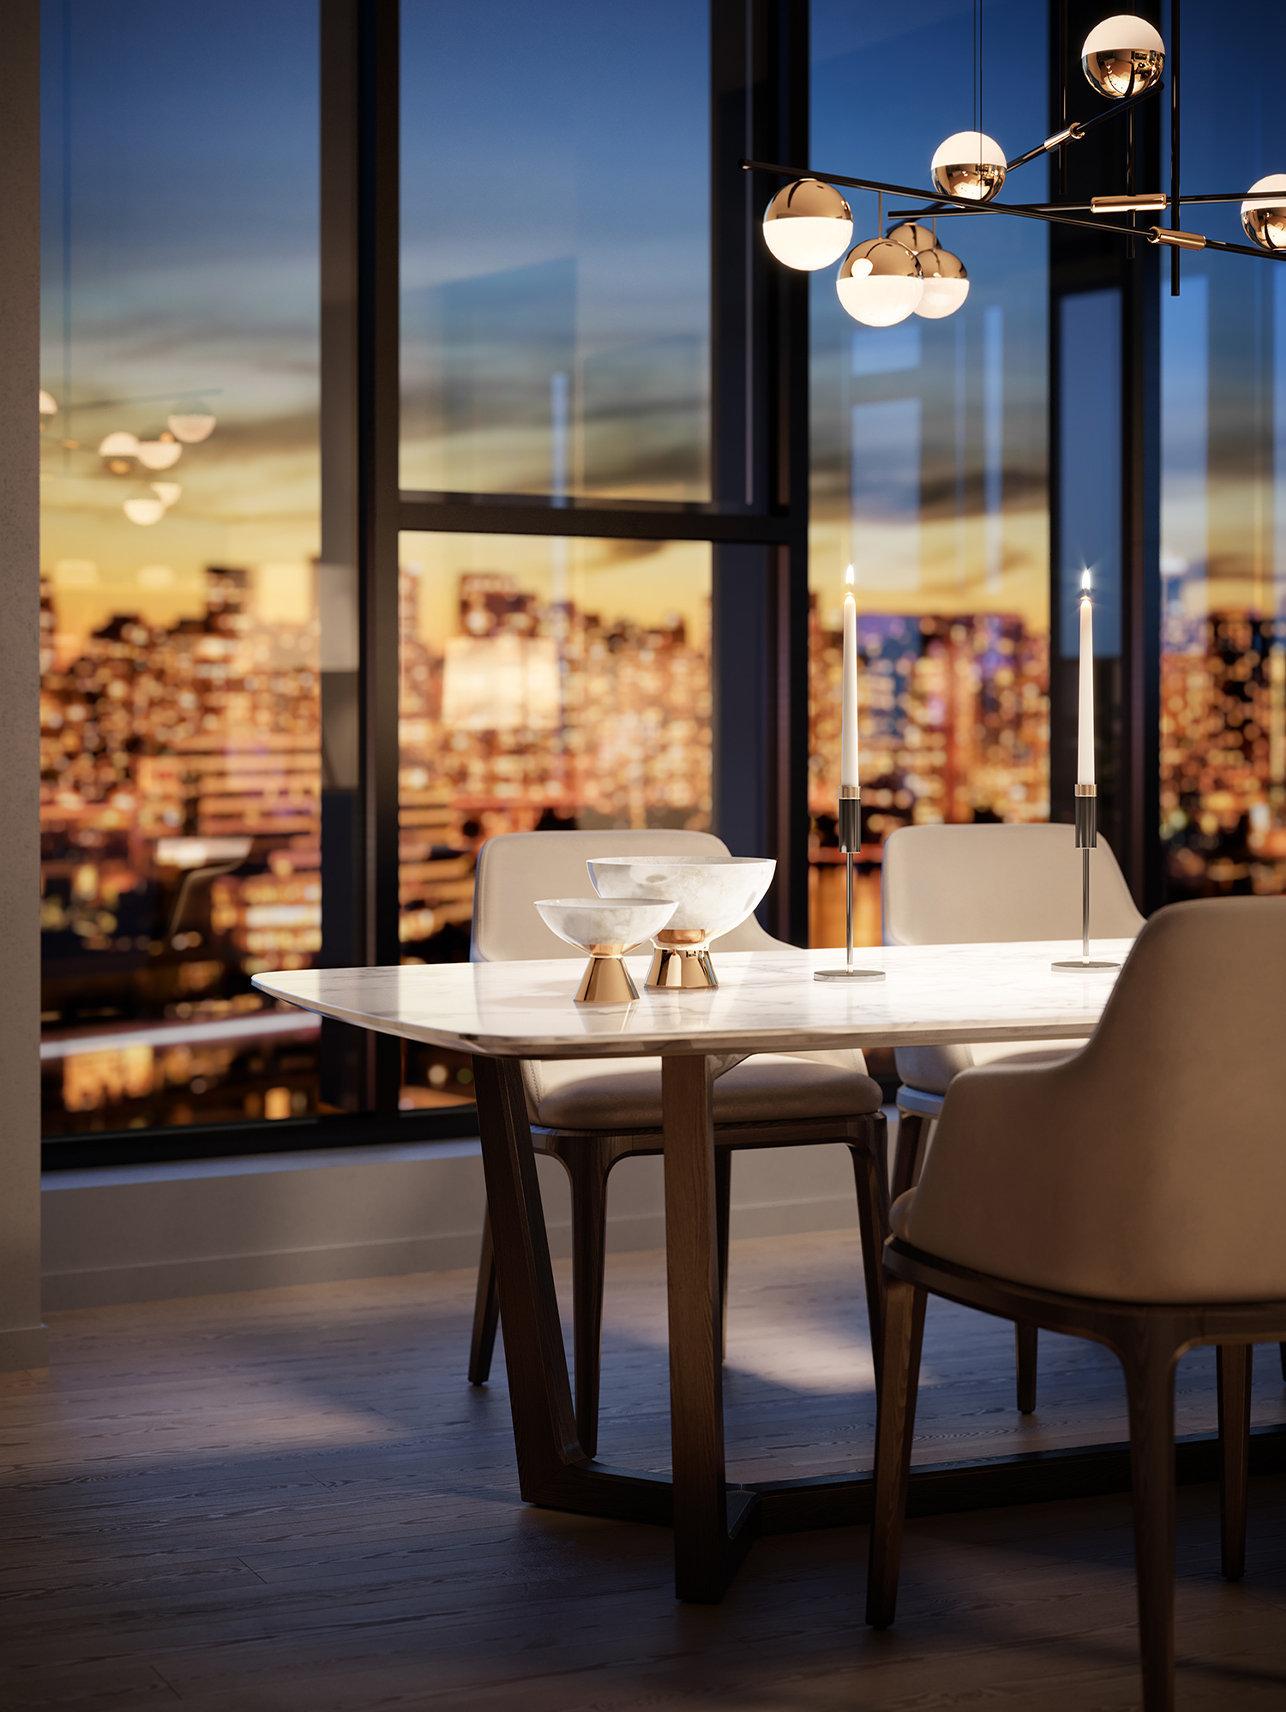 Tesoro - 1551 Quebec St - Dining Table/Views!